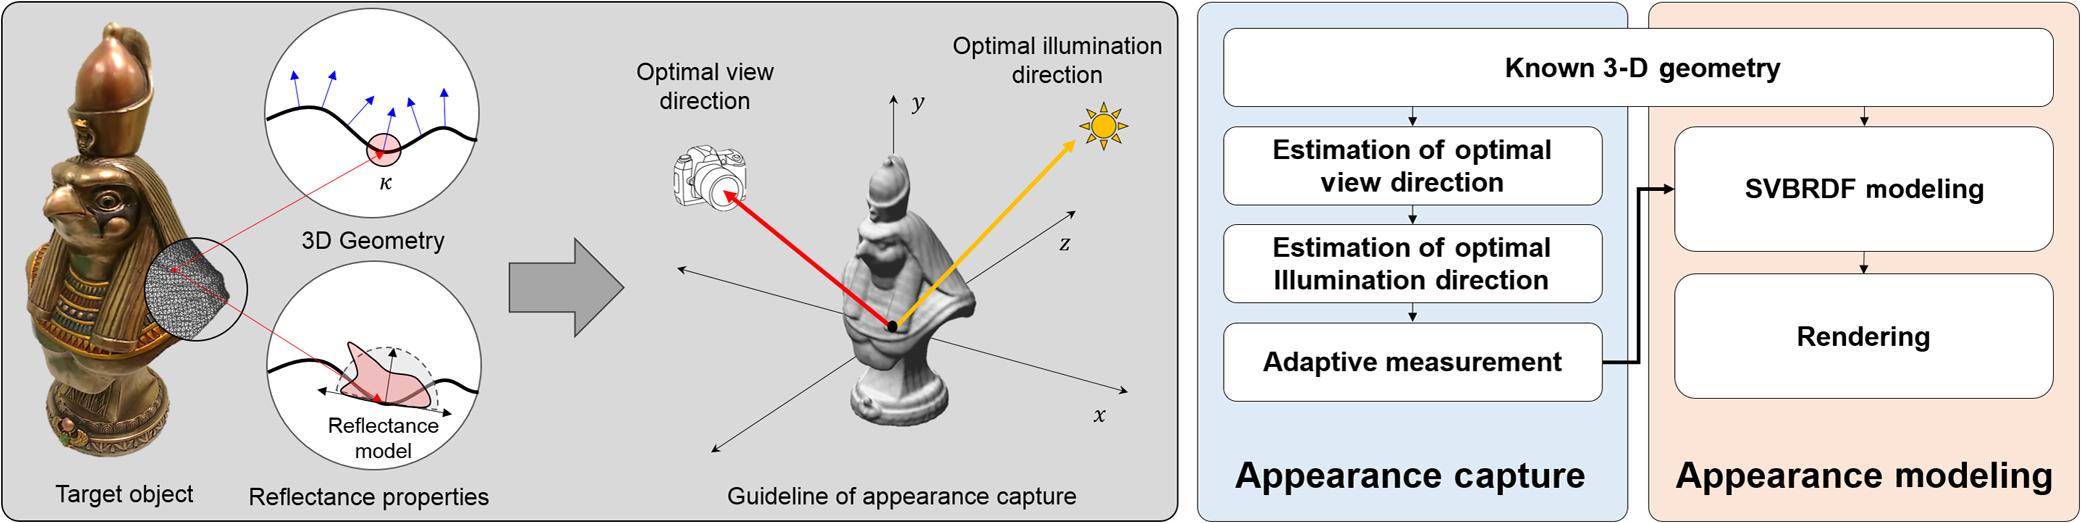 Adaptive view and illumination planning for SVBRDF